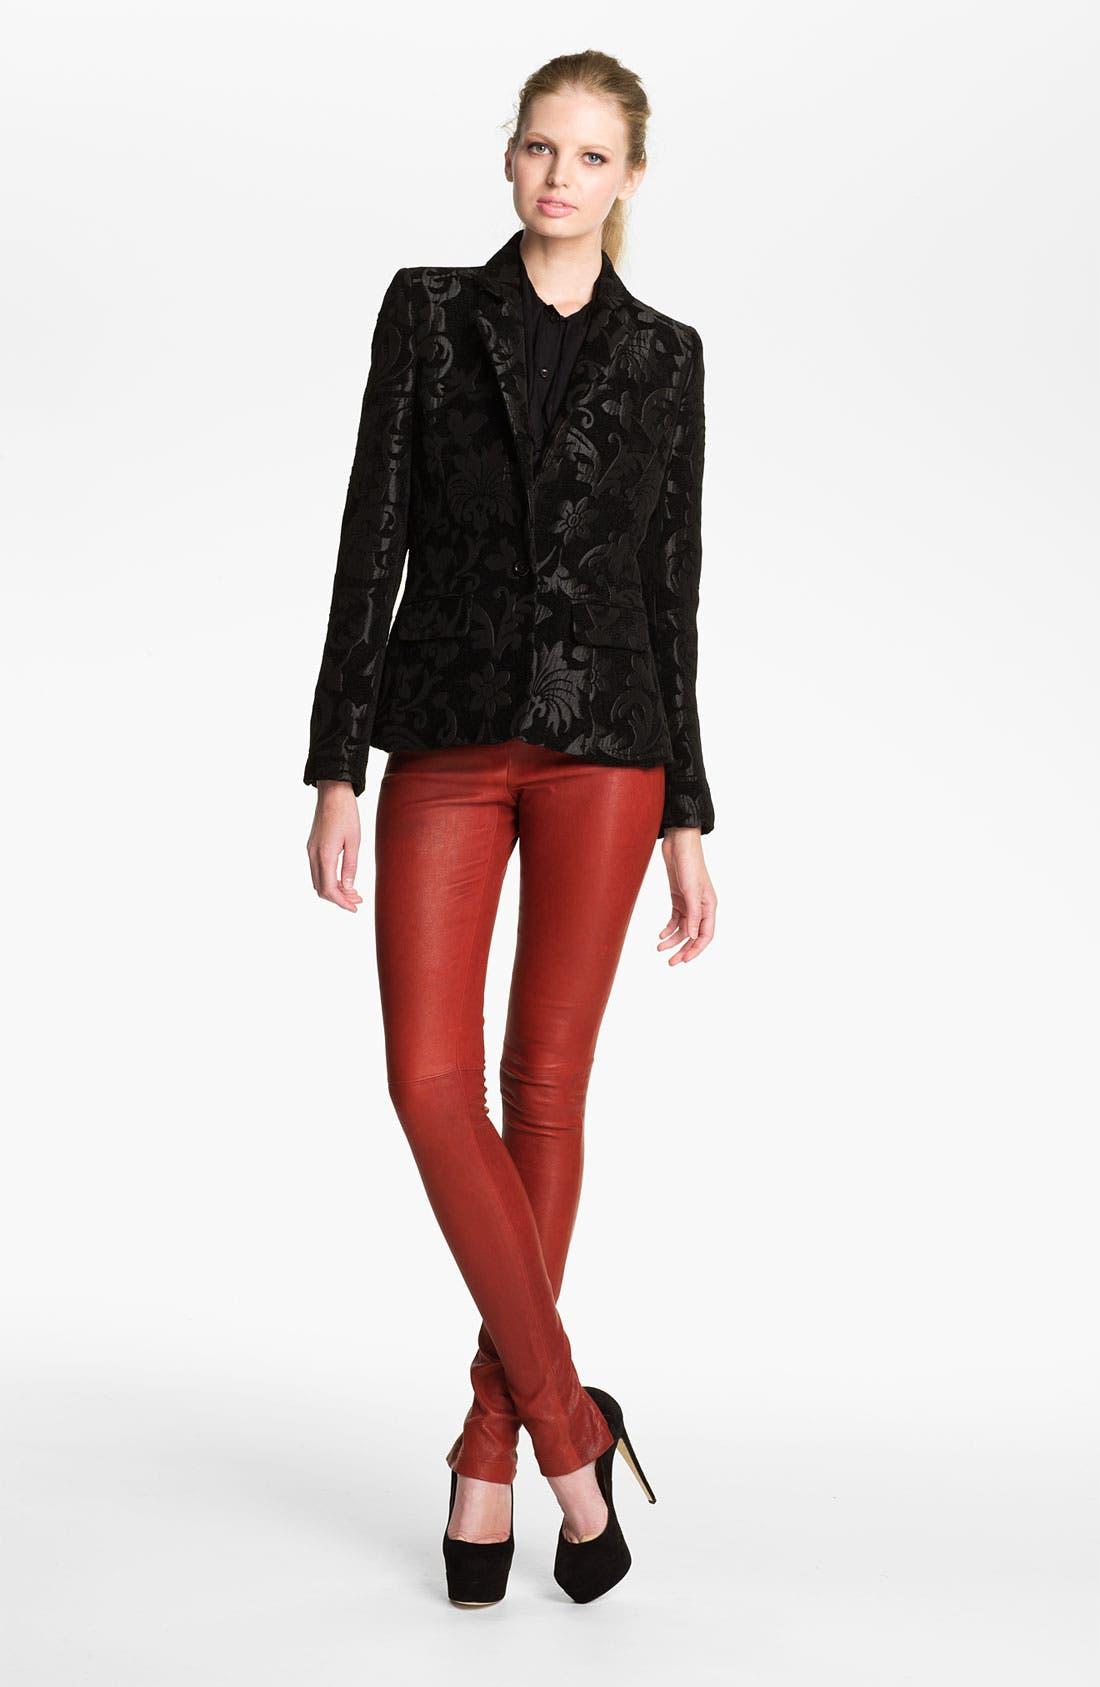 Main Image - Alice + Olivia 'Elyse' Metallic Brocade Blazer